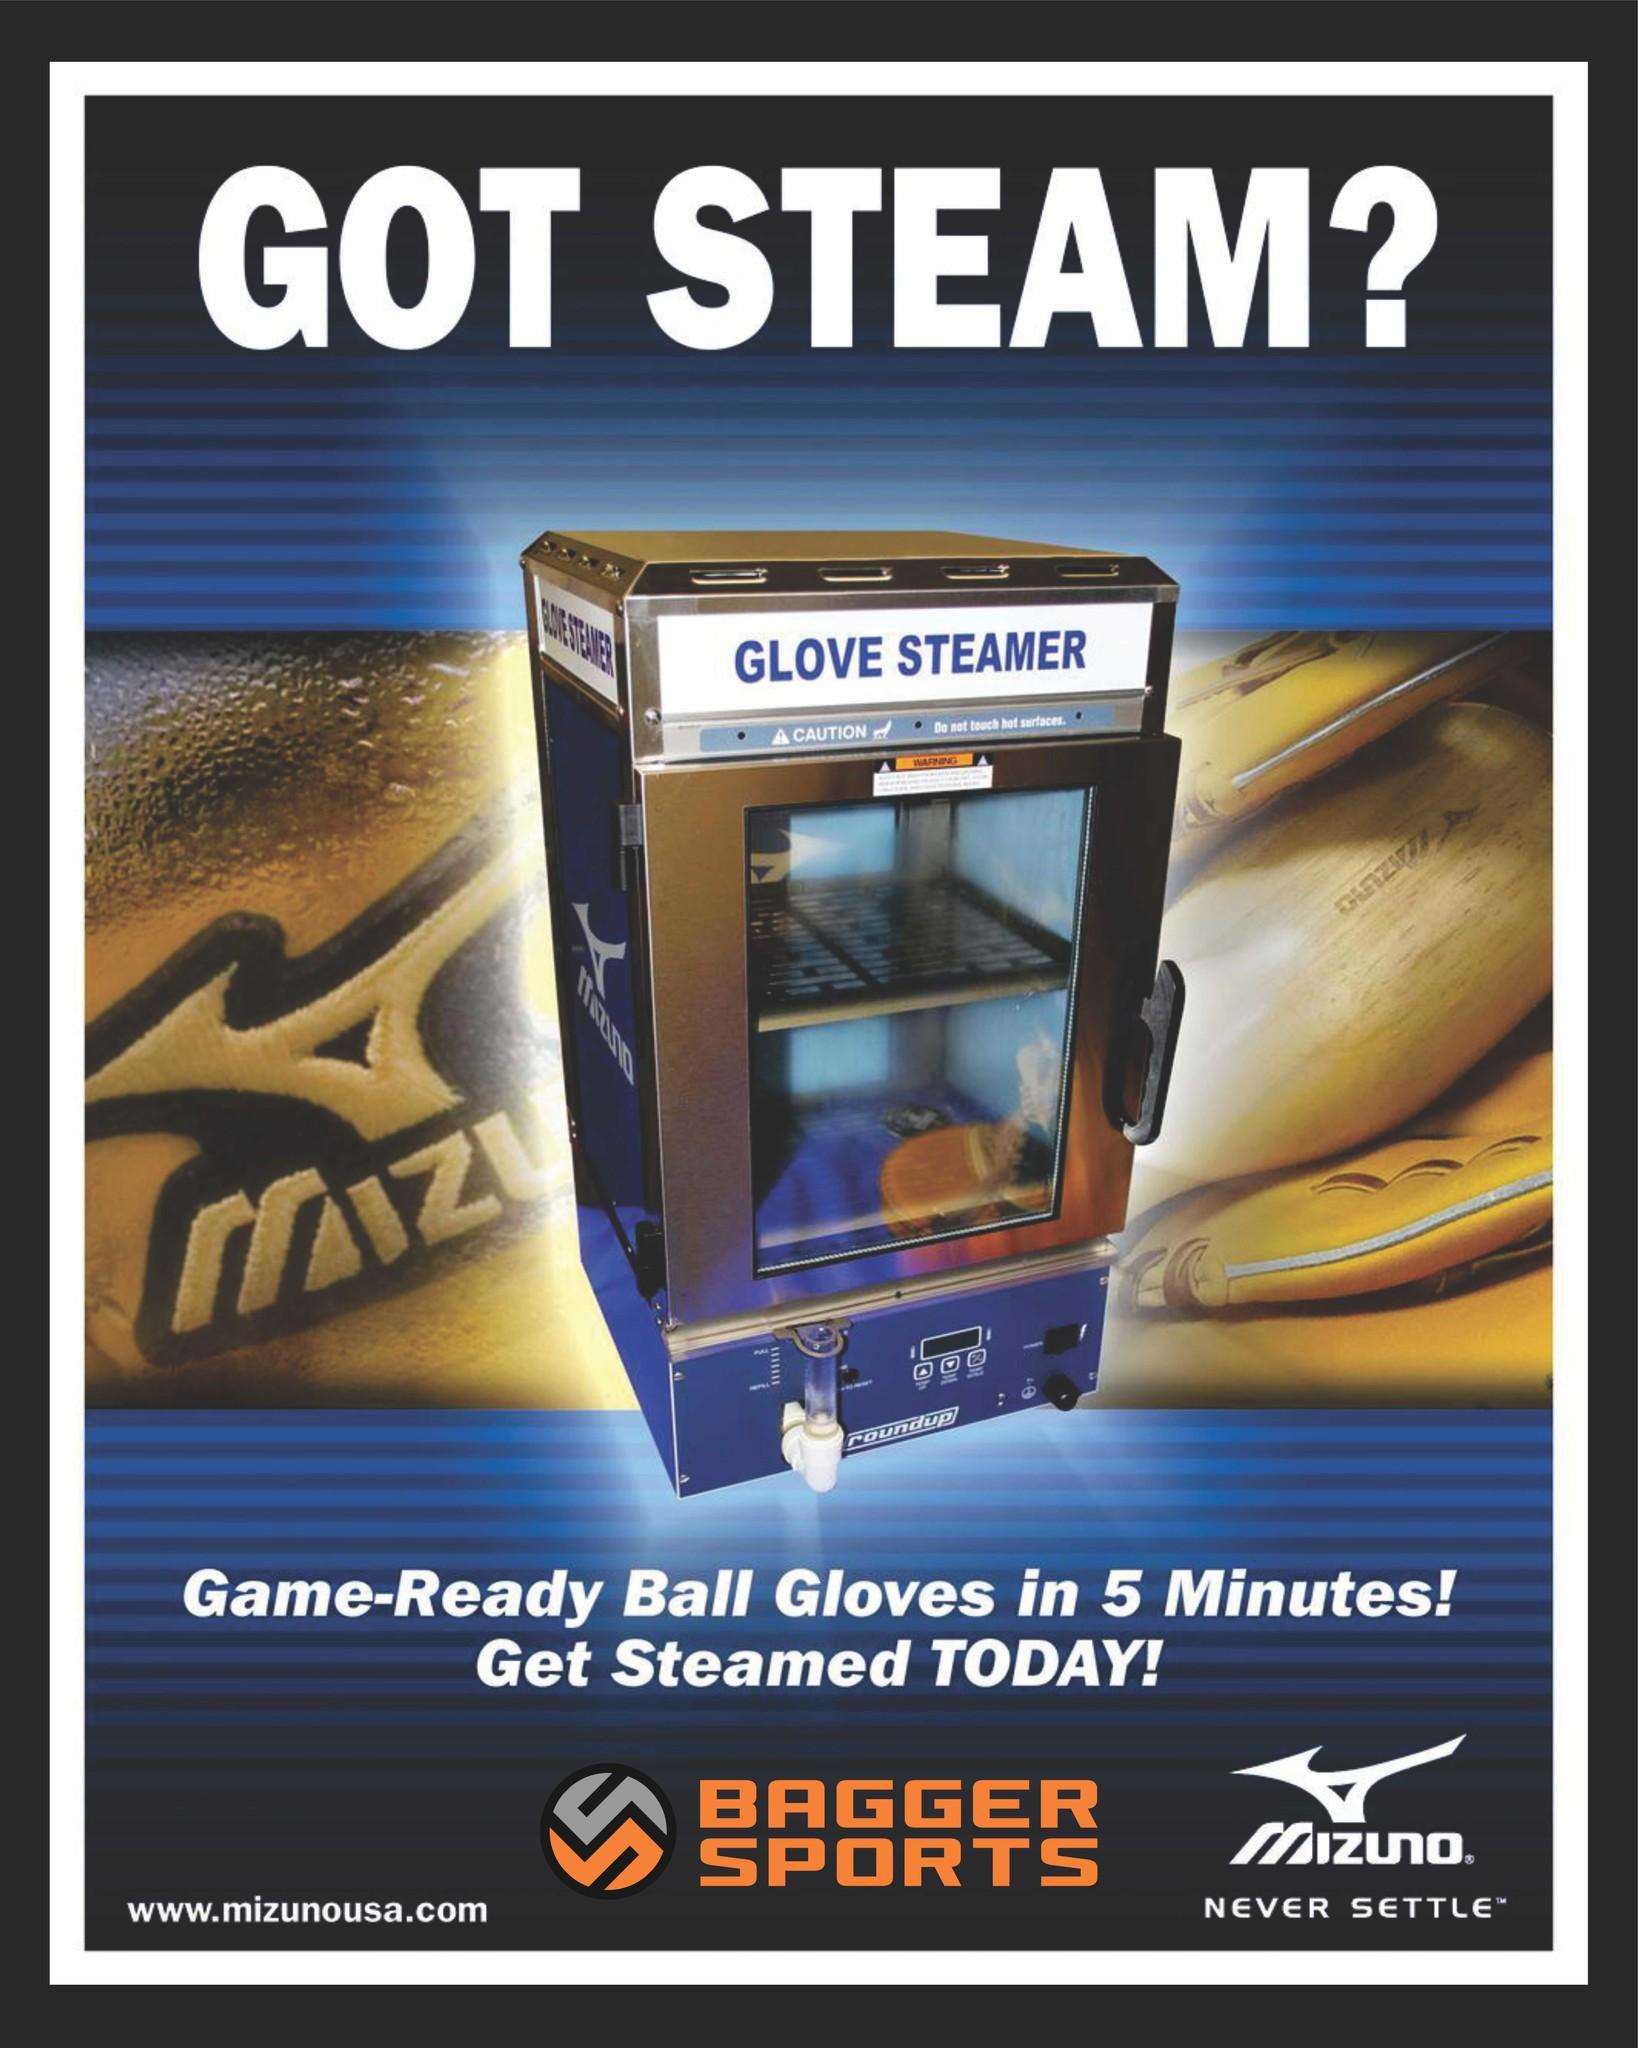 Bagger Sports Glove Steamer